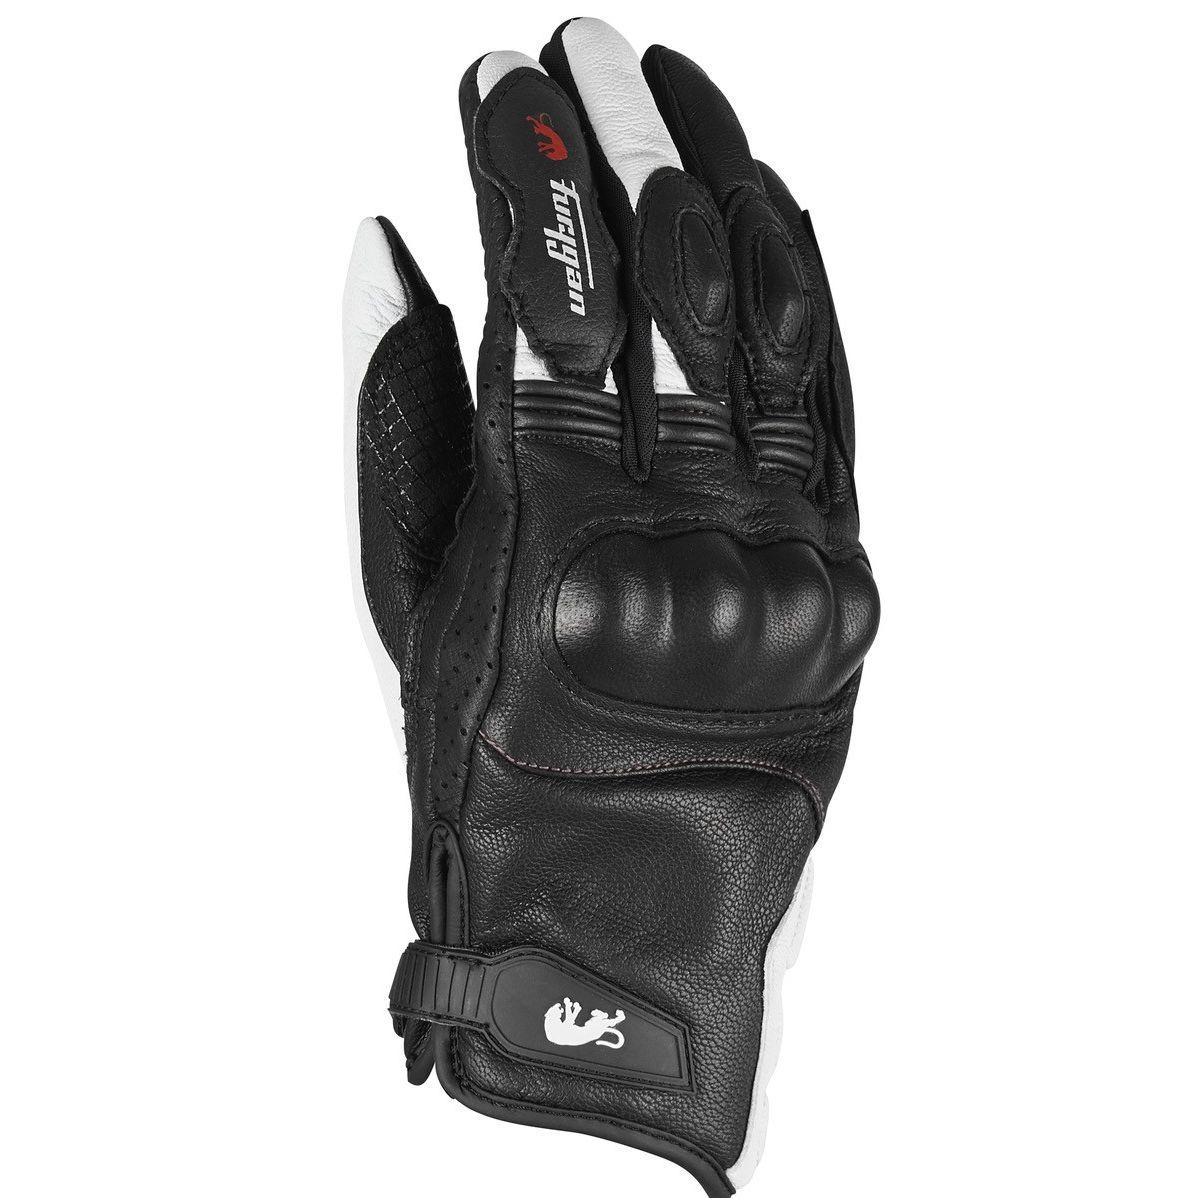 Negro talla XL Furygan guantes TD21